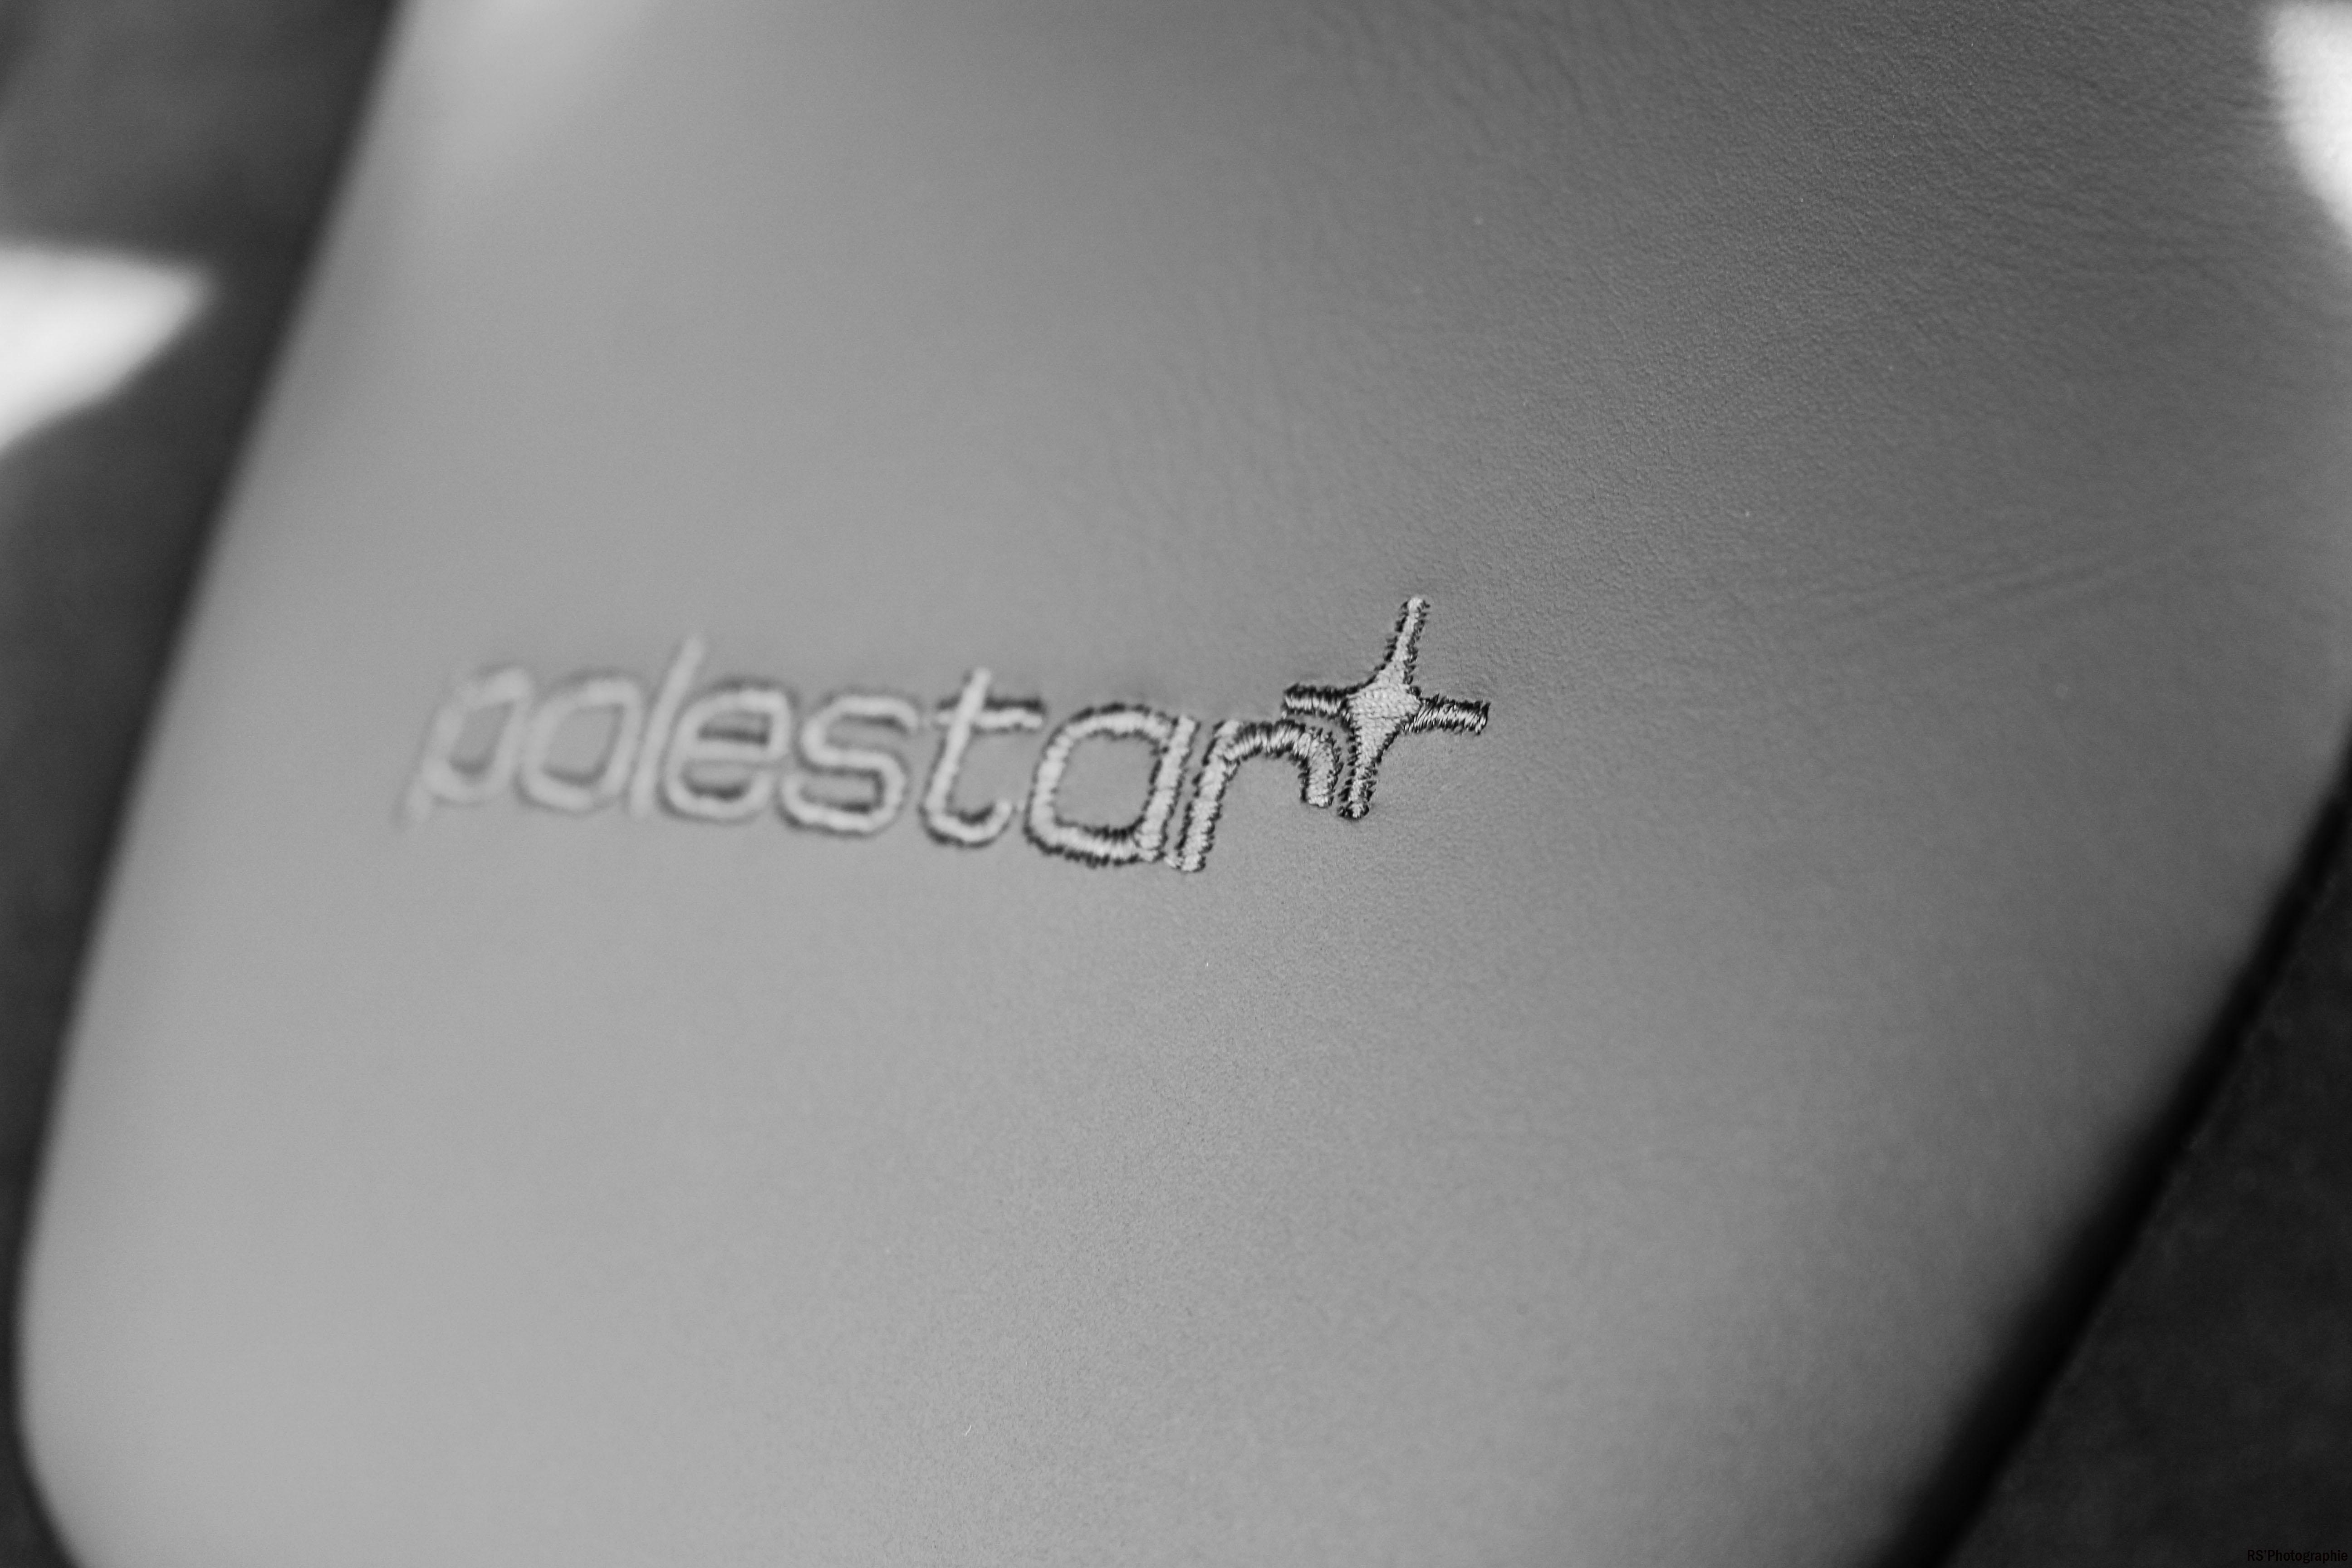 volvos60polestar40-volvo-s60-polestar-intérieur-onboard-Arnaud Demasier-RSPhotographie